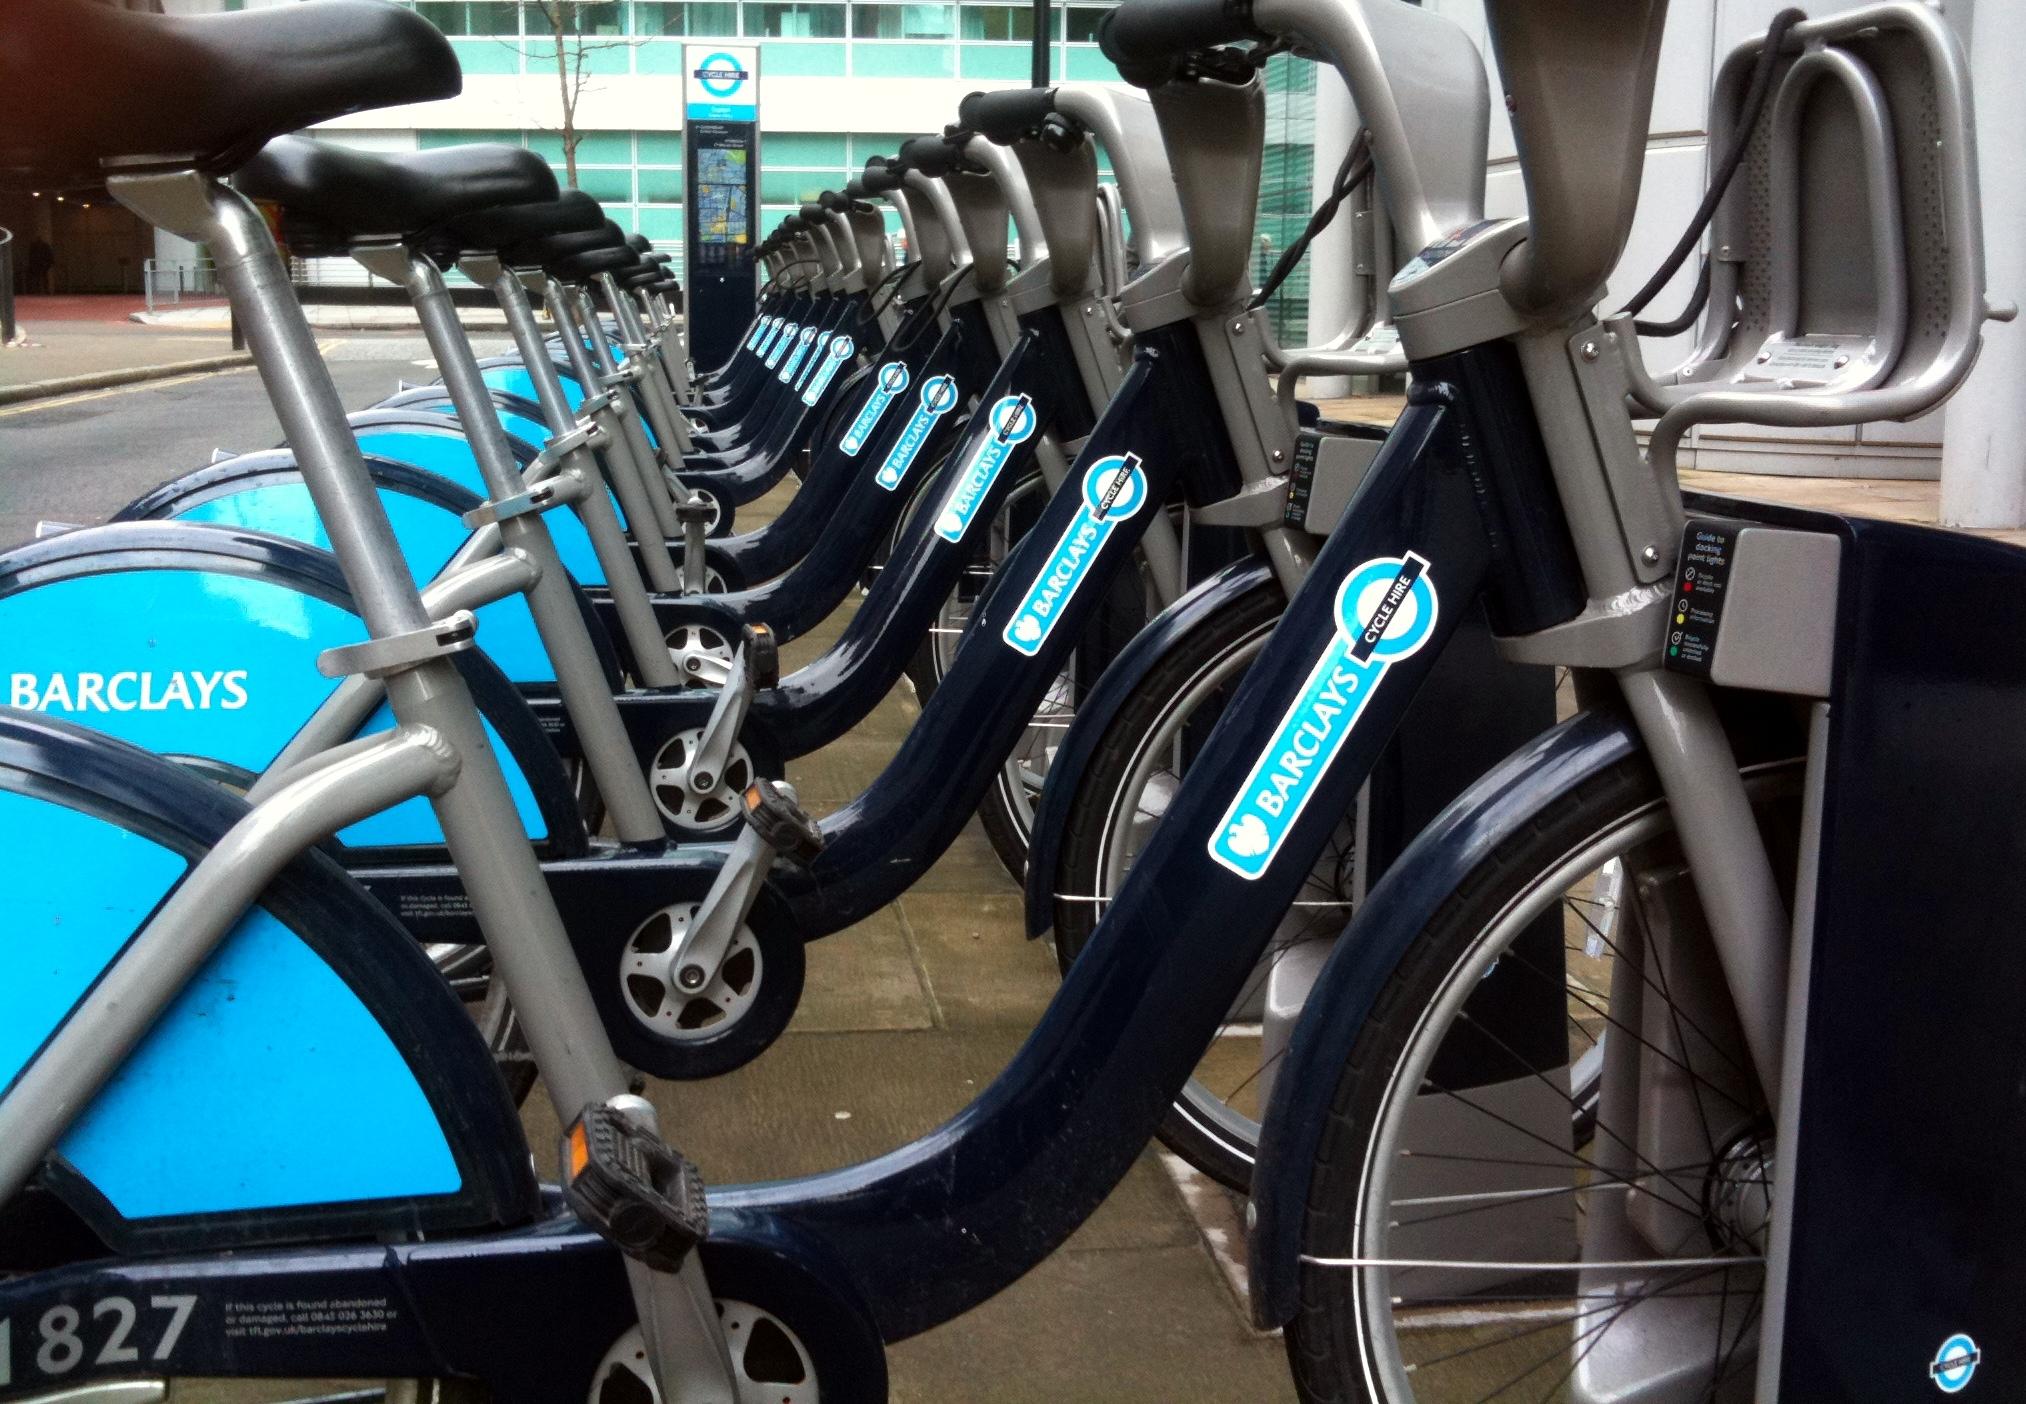 Bicycle rental statistics in the UK?